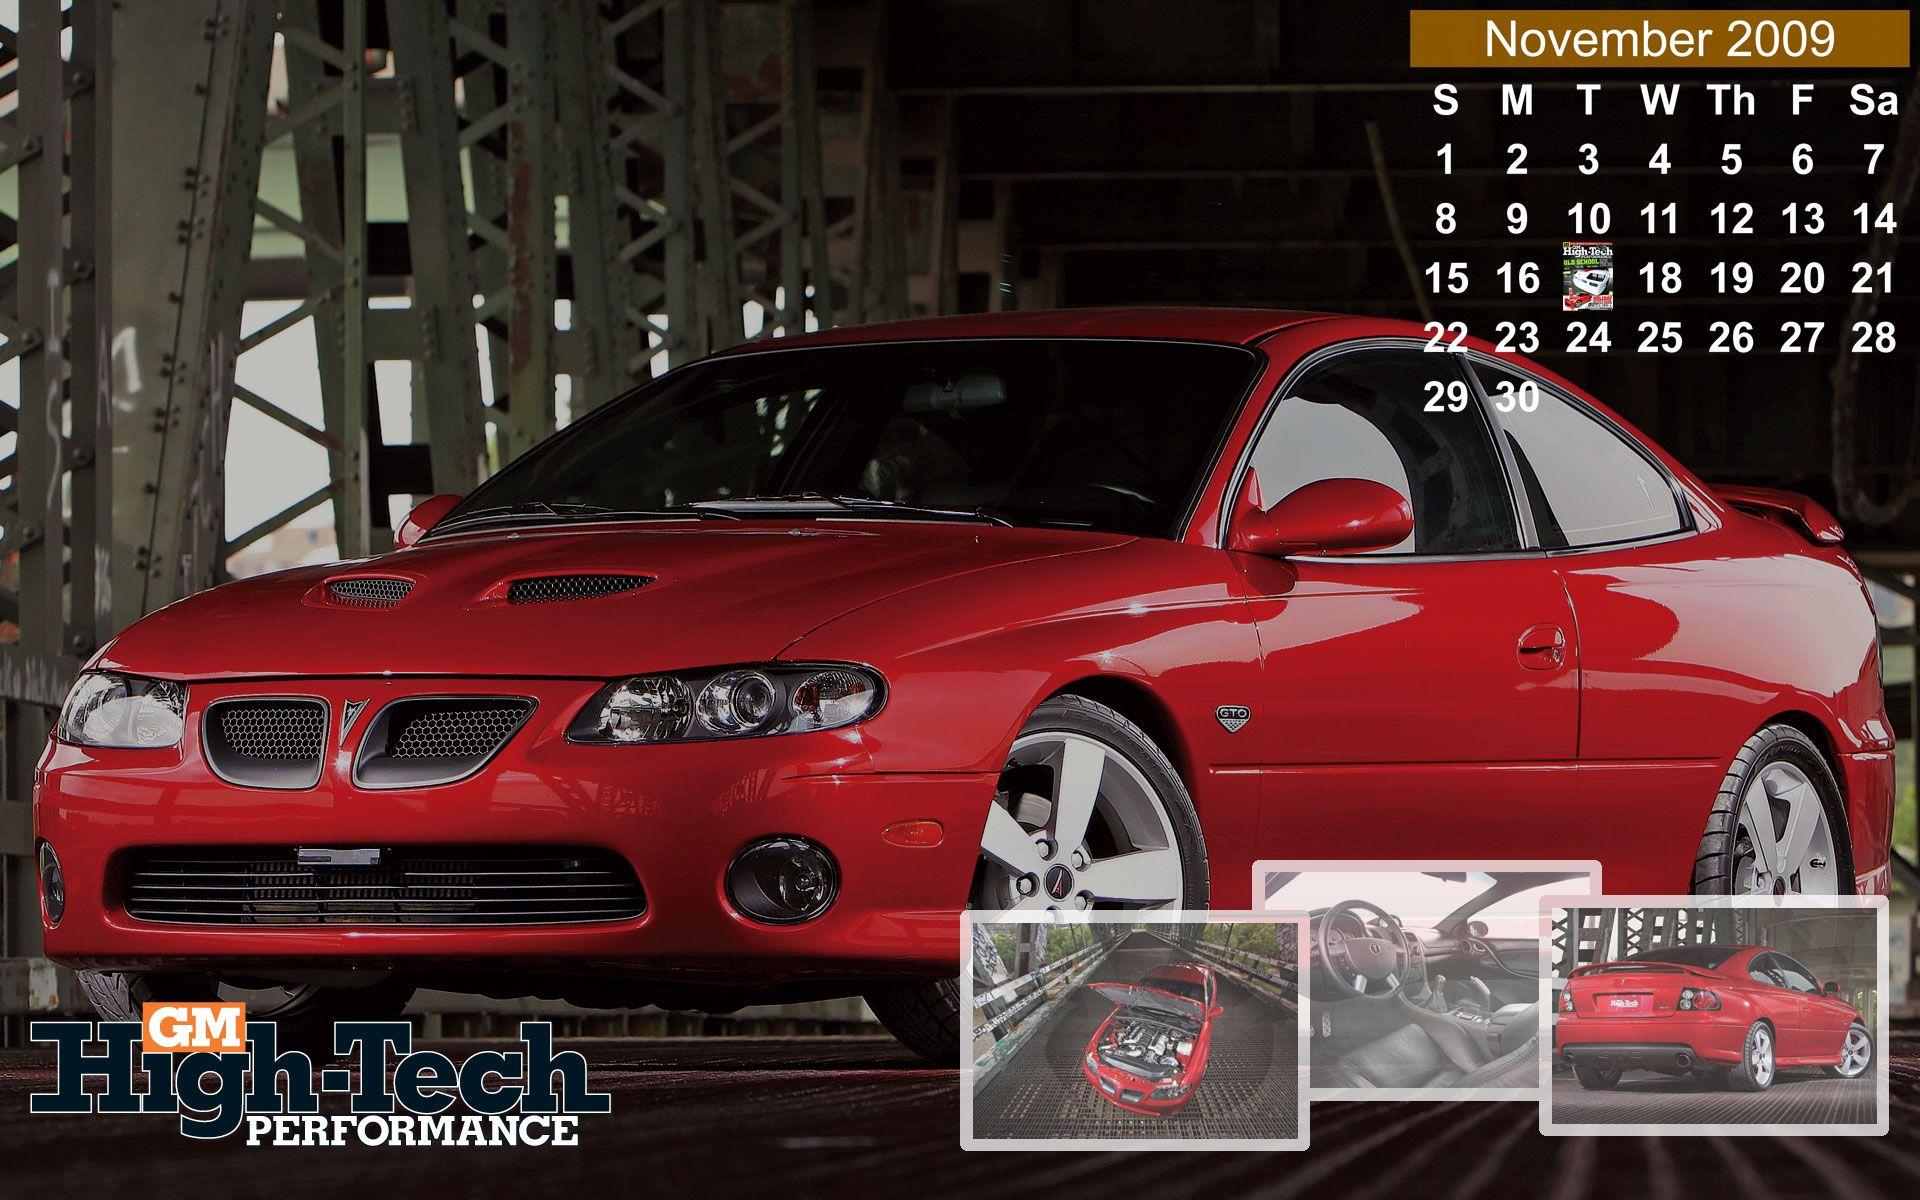 2006 Pontiac Gto wallpaper   188648 1920x1200